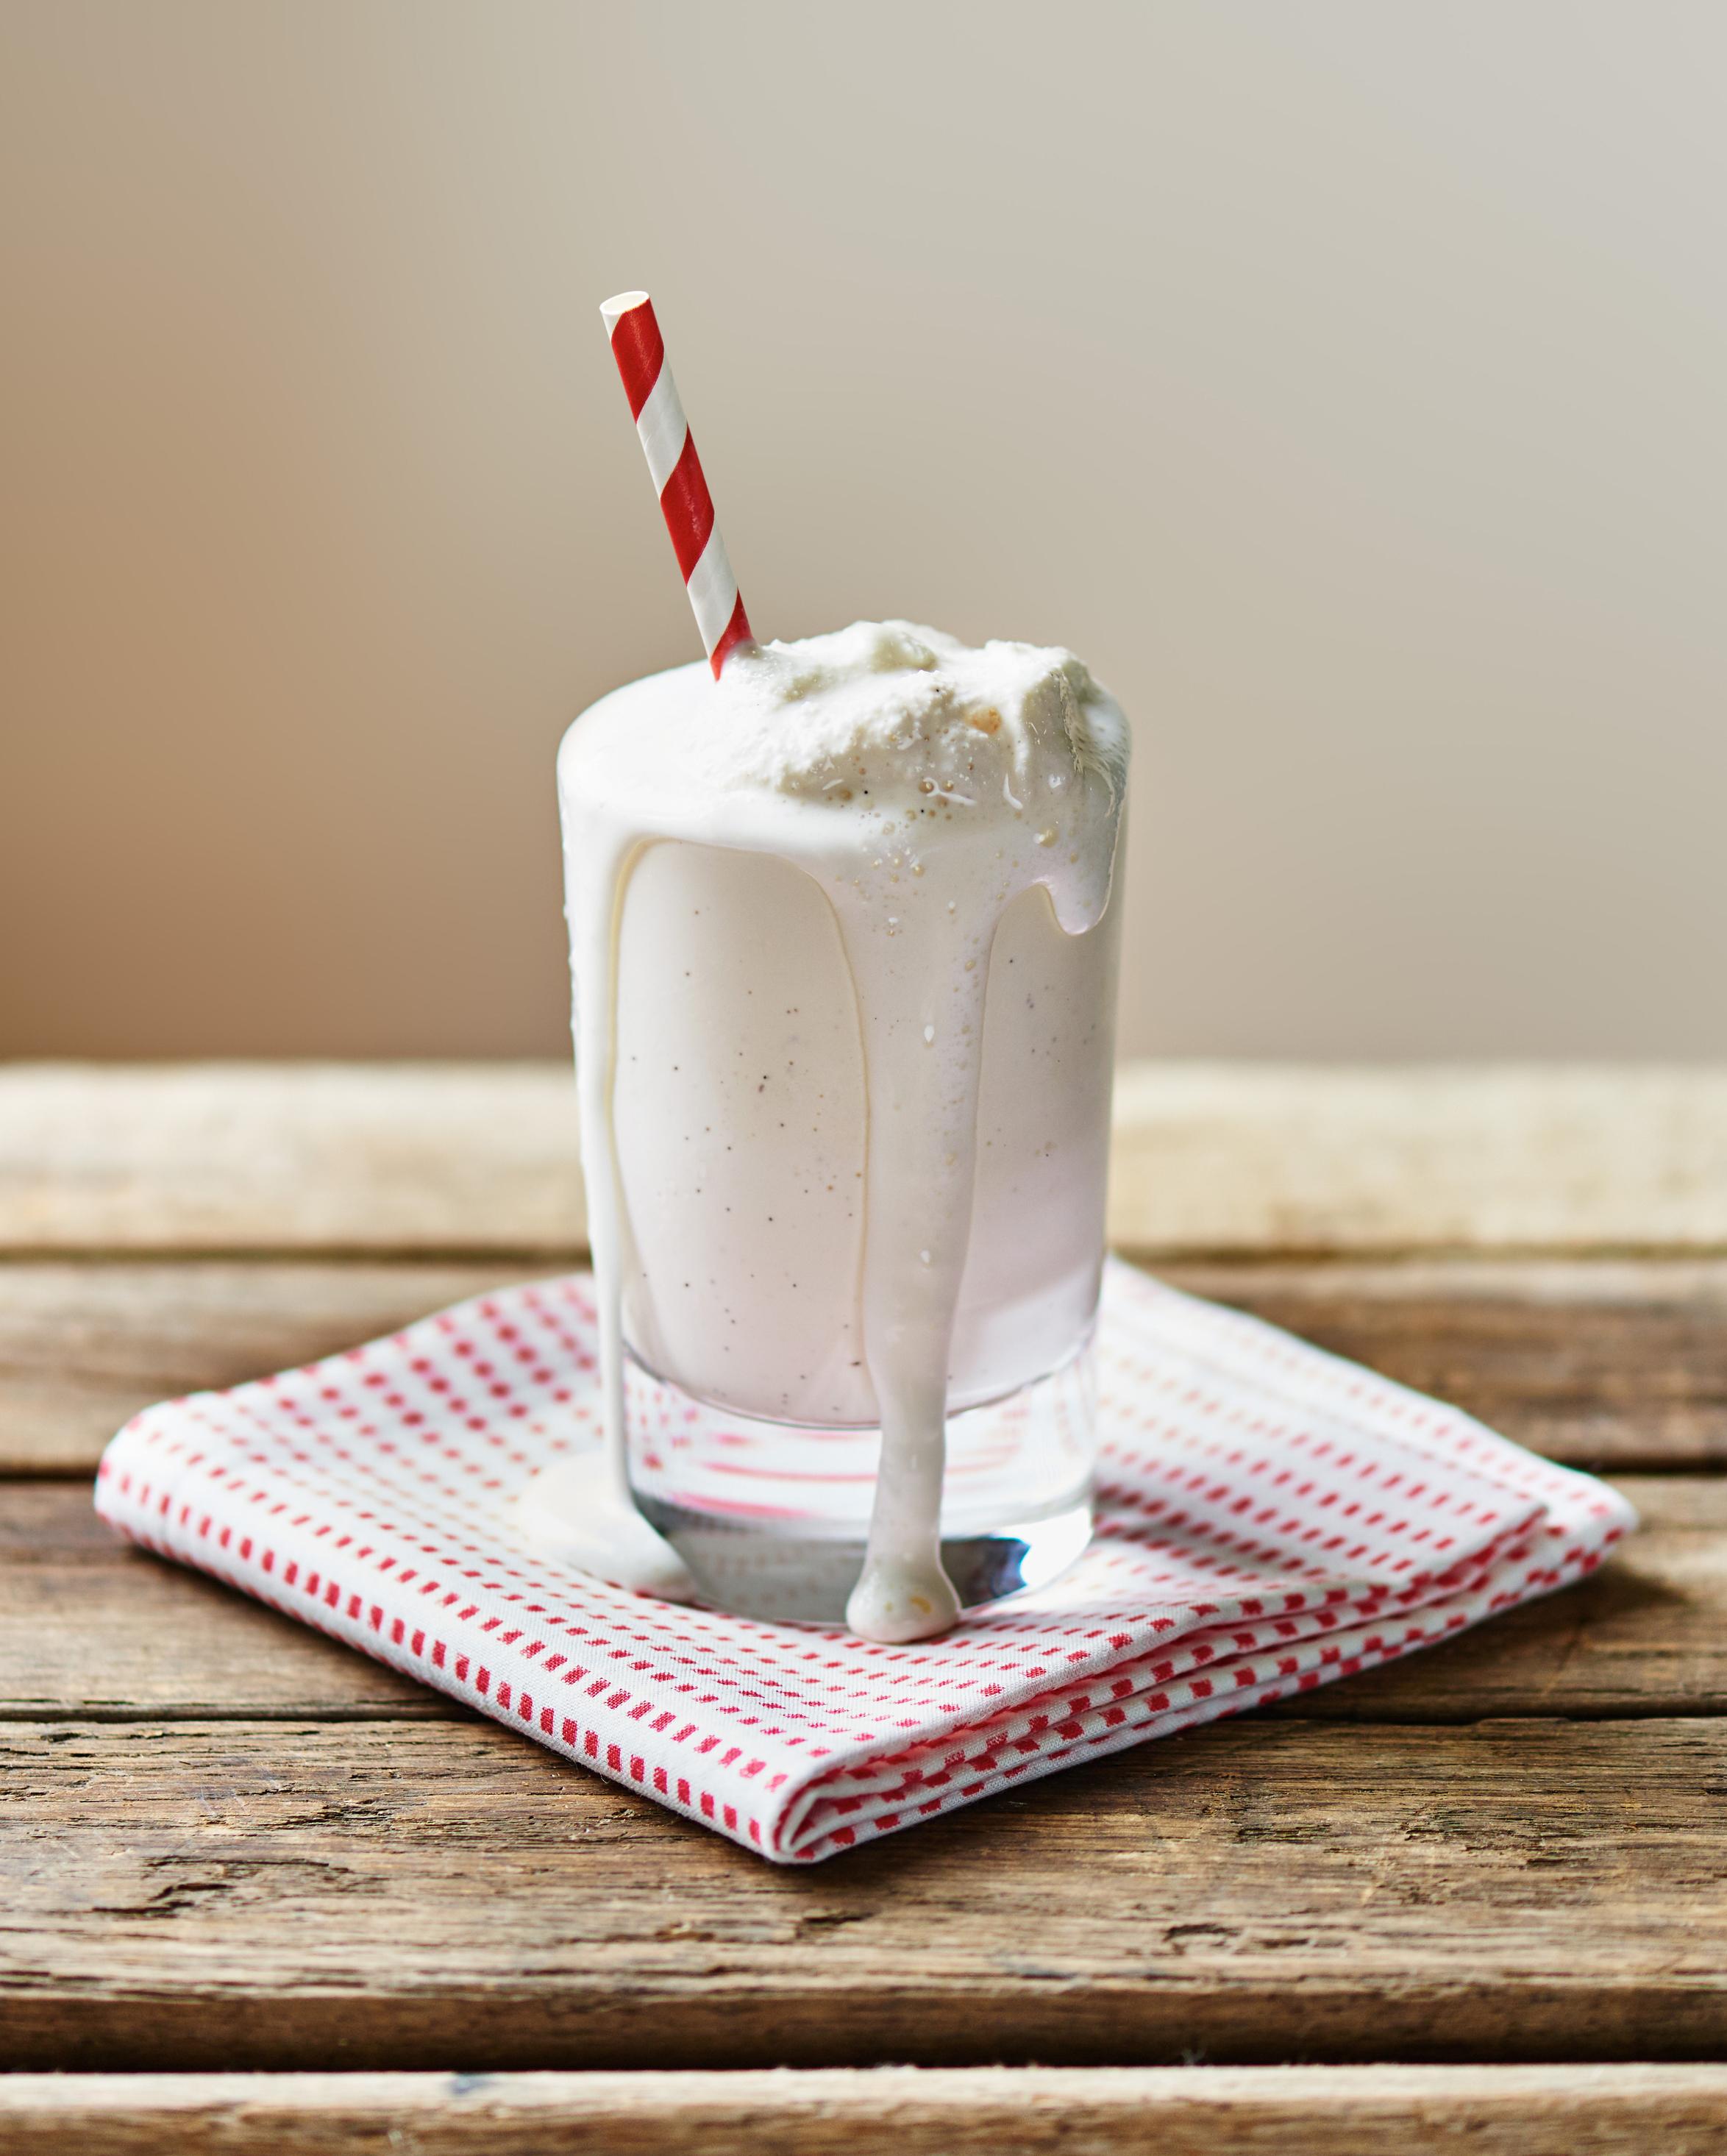 late-night-milkshake-vanilla-salt-and-straw-intro-image-0615.jpg